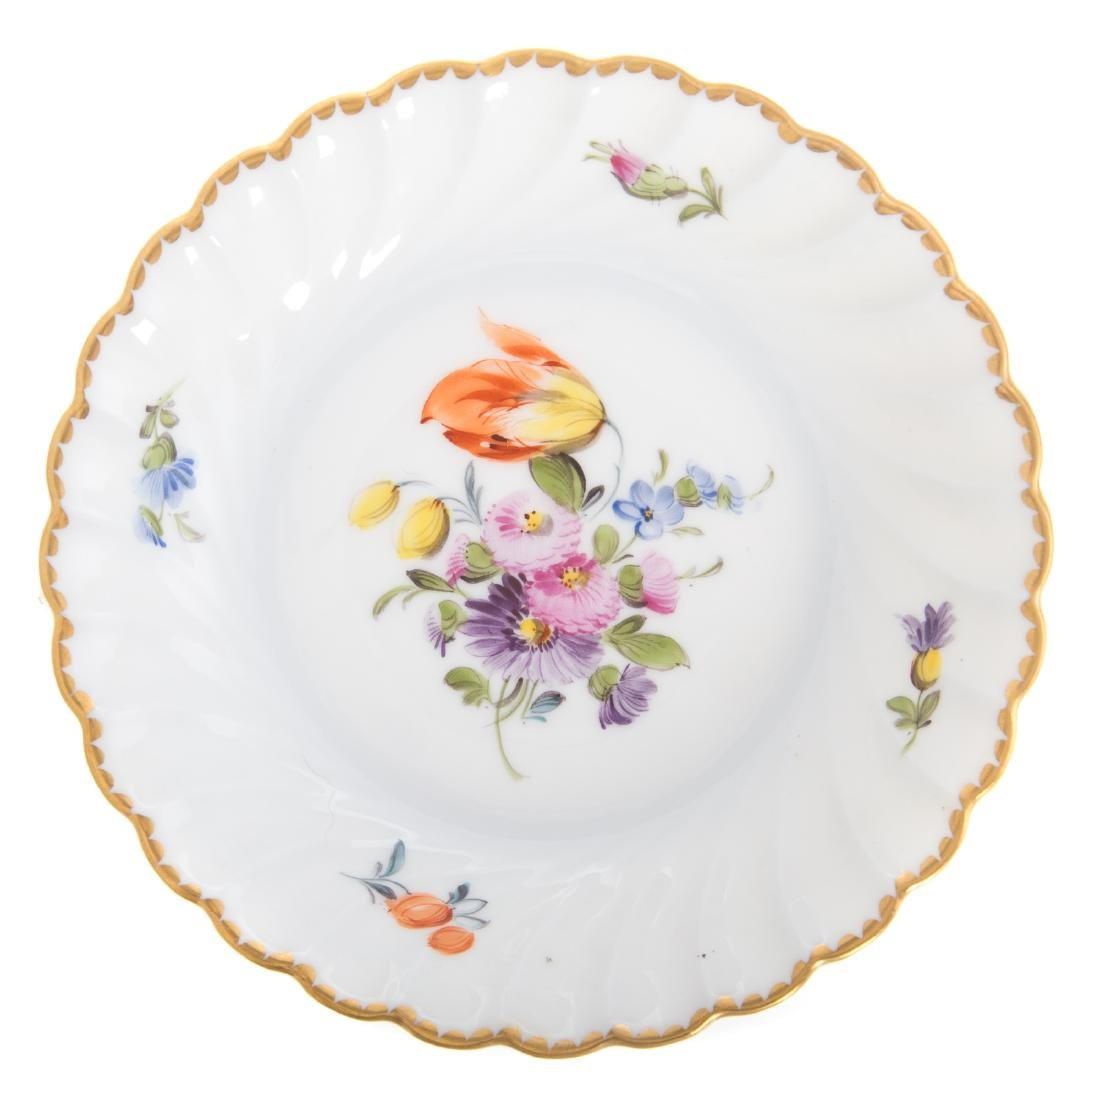 Nymphenburg porcelain dinner service - 2